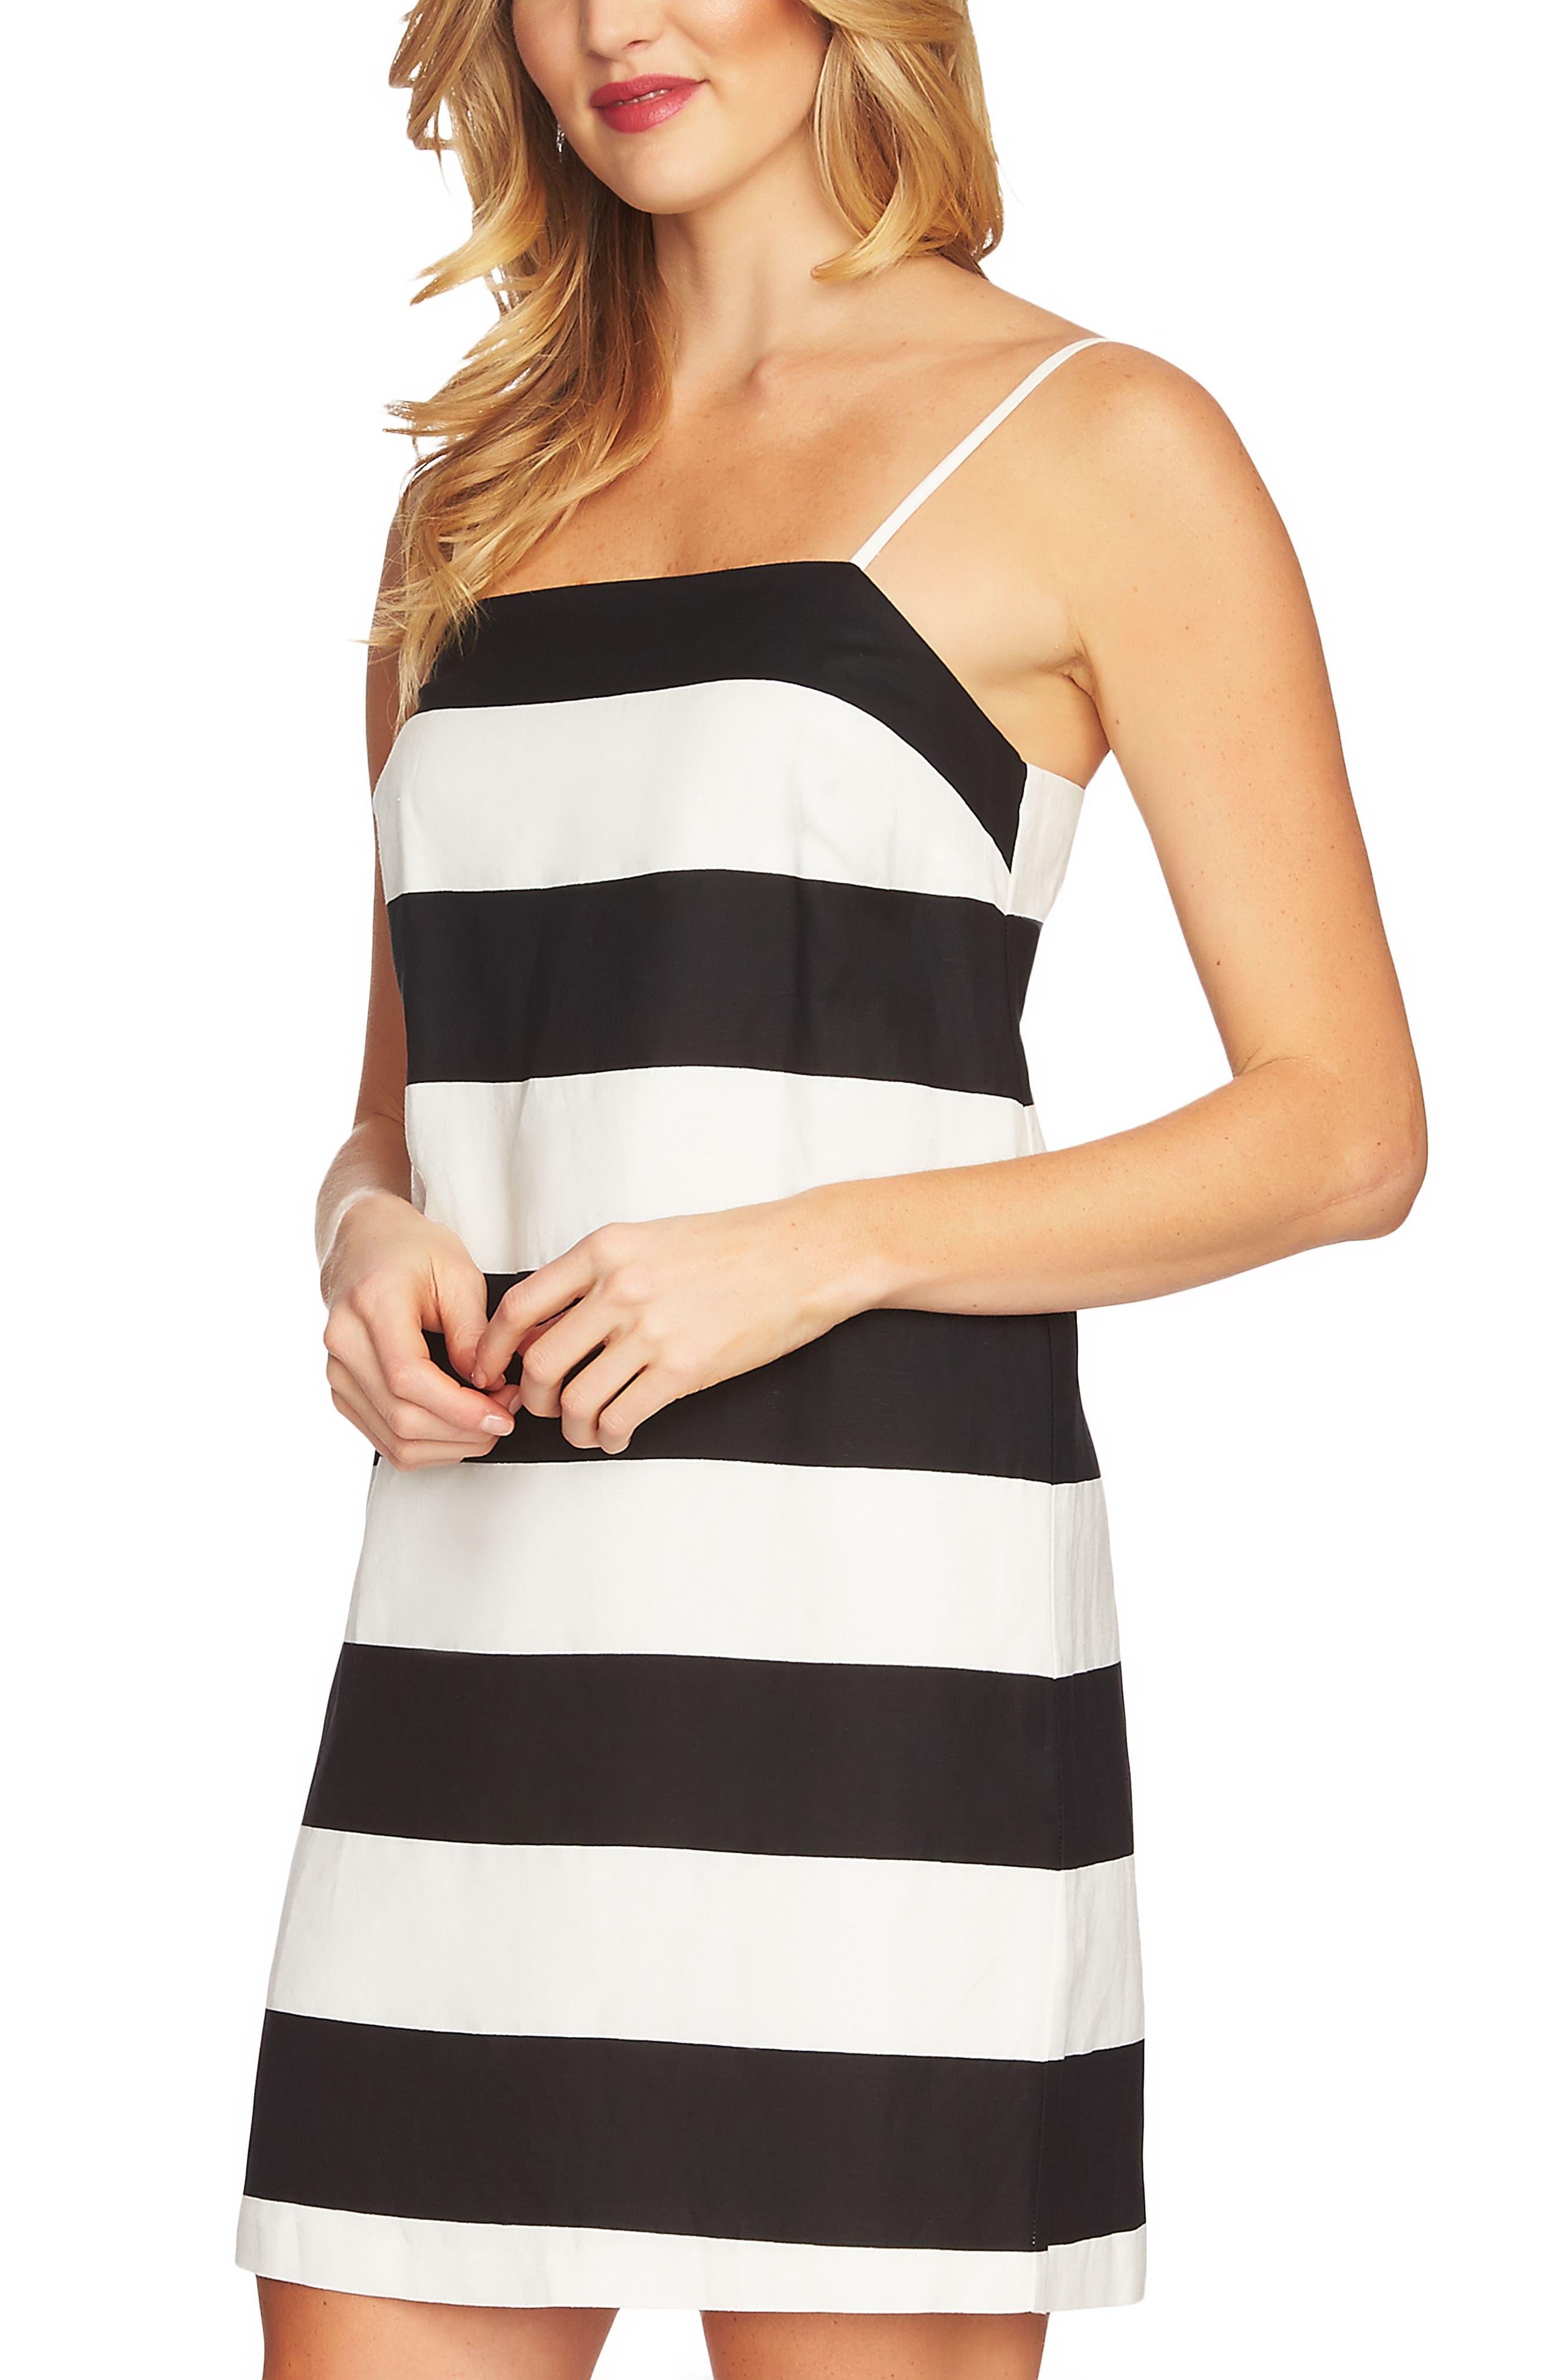 Carnival Stripe Dress,                             Alternate thumbnail 8, color,